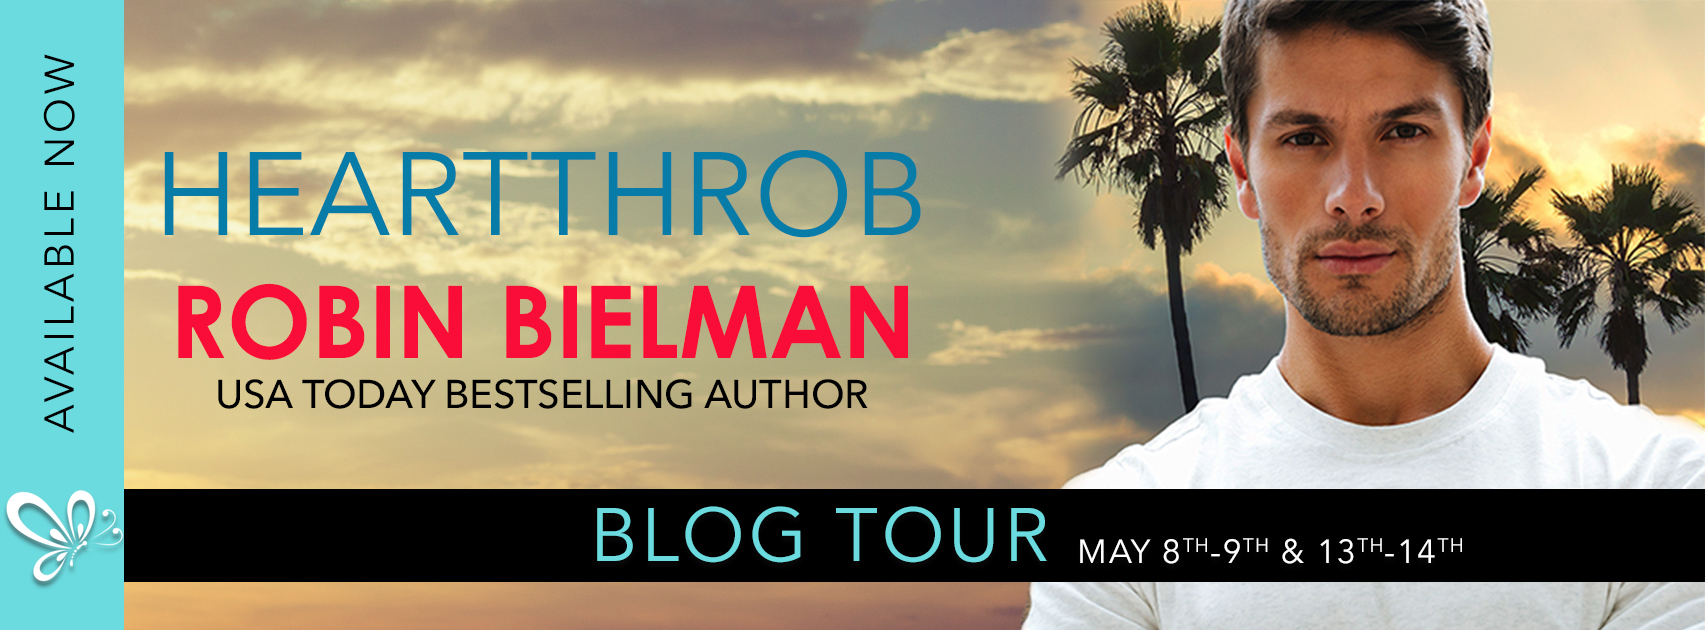 Blog Tour Review:  Heartthrob (American Royalty #1) by Robin Bielman